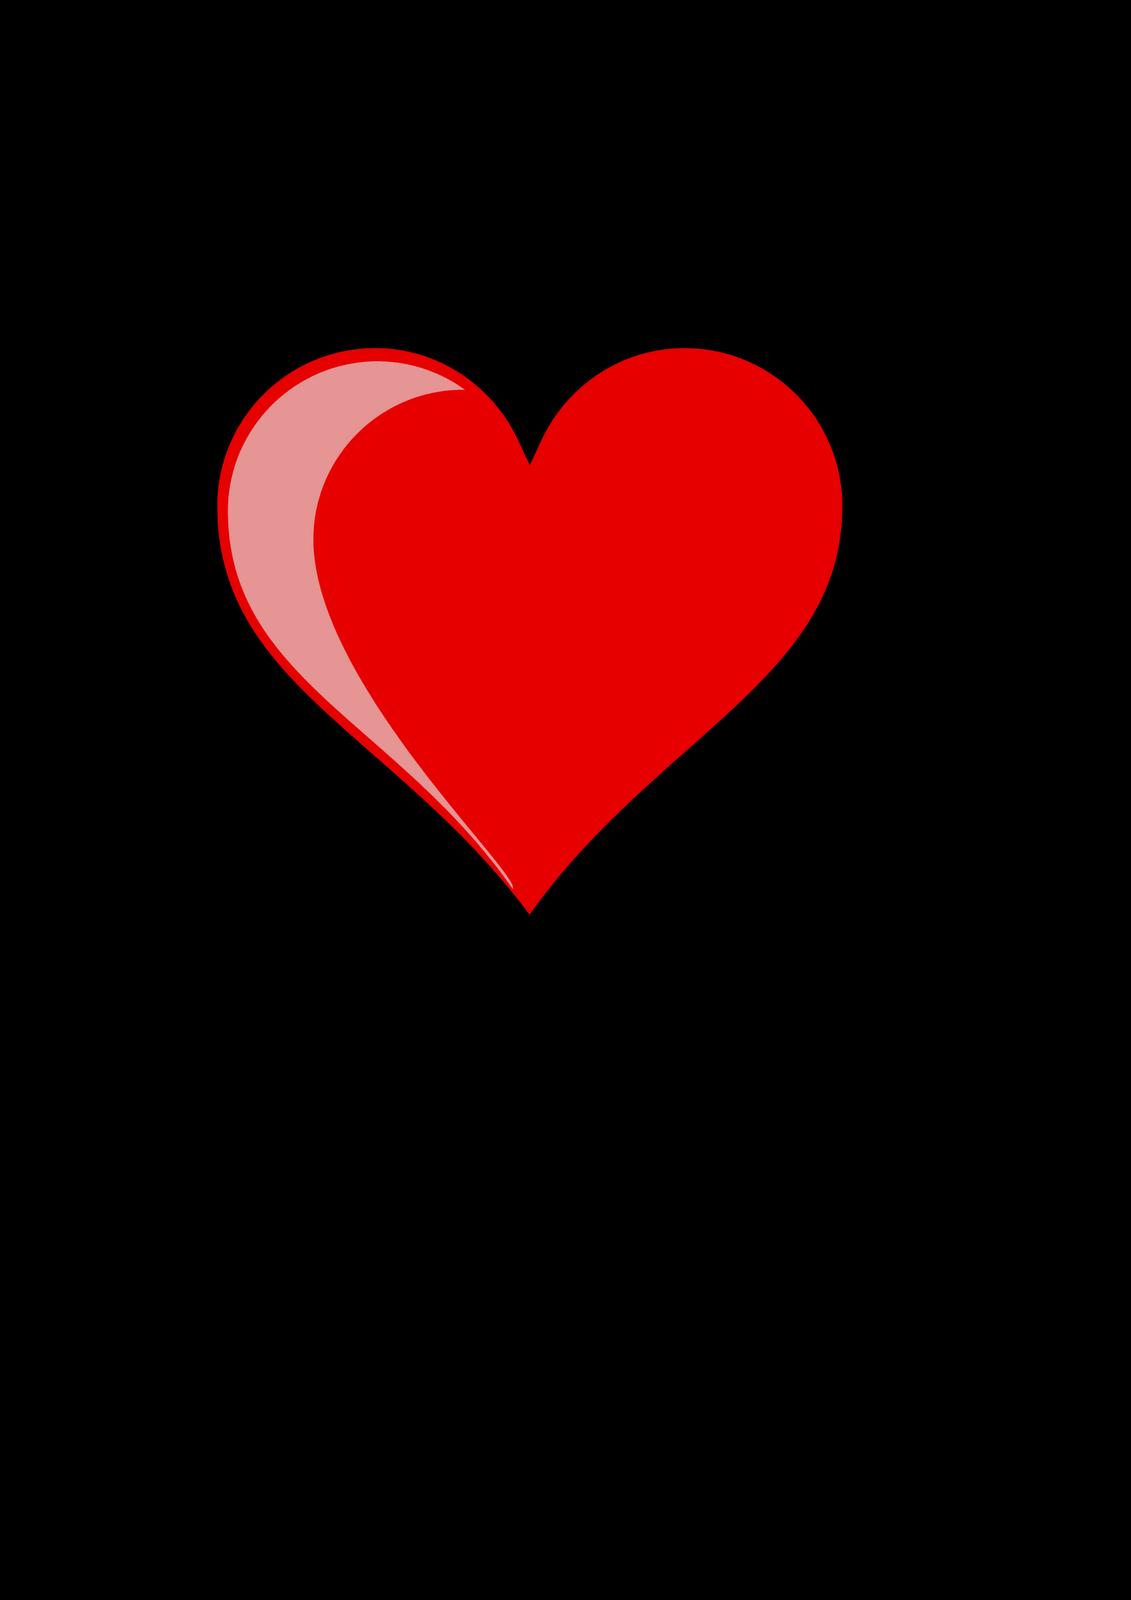 Free Valentineu0026#39;s Day Clip Art | -Free Valentineu0026#39;s Day Clip Art | 2014 Valentine Card, Free-10